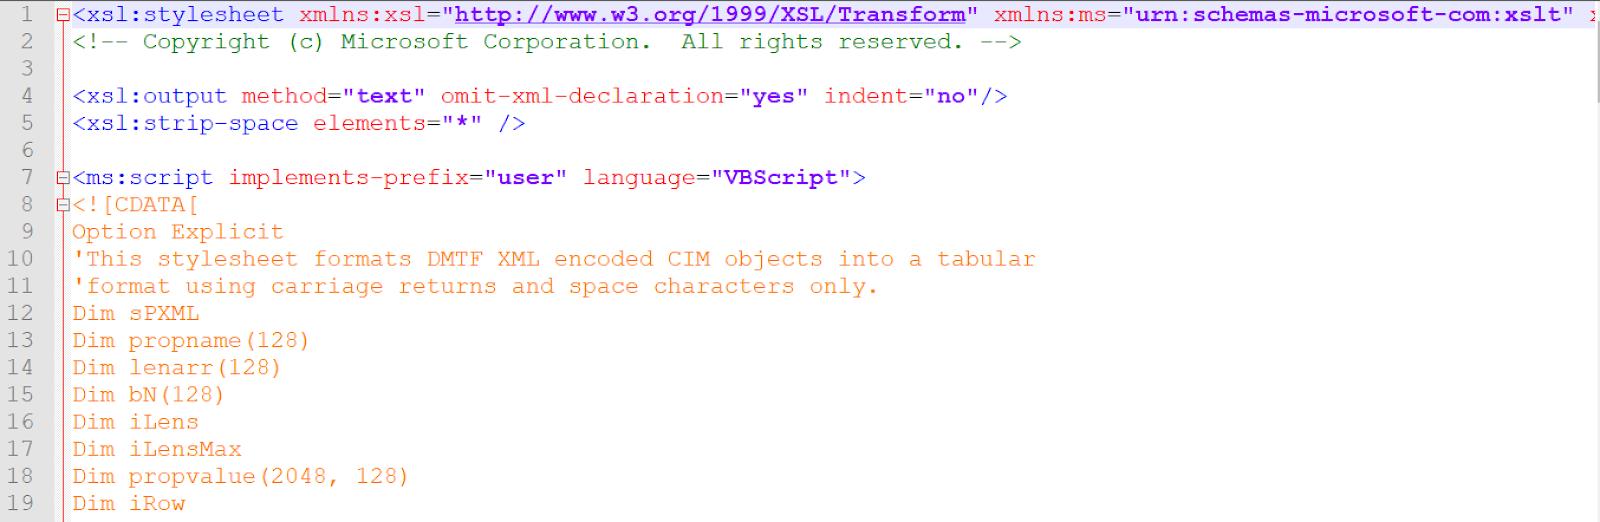 subTee: WMIC EXE Whitelisting Bypass - Hacking with Style, Stylesheets